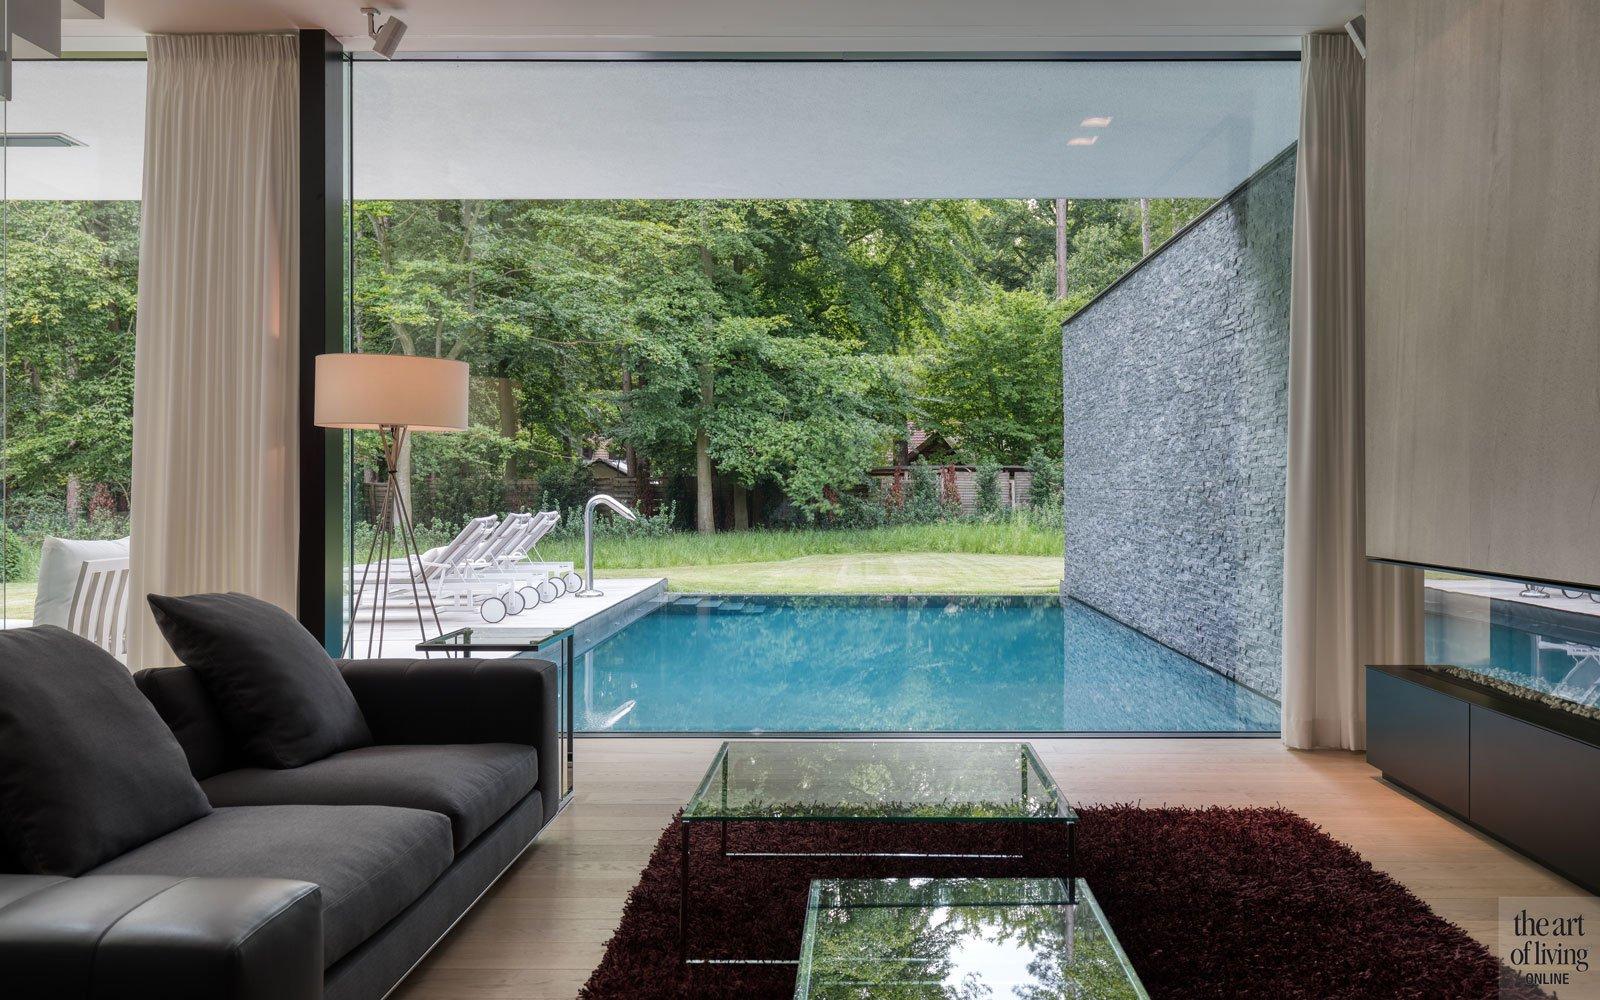 Moderne villa , Icoon architecten, the art of living